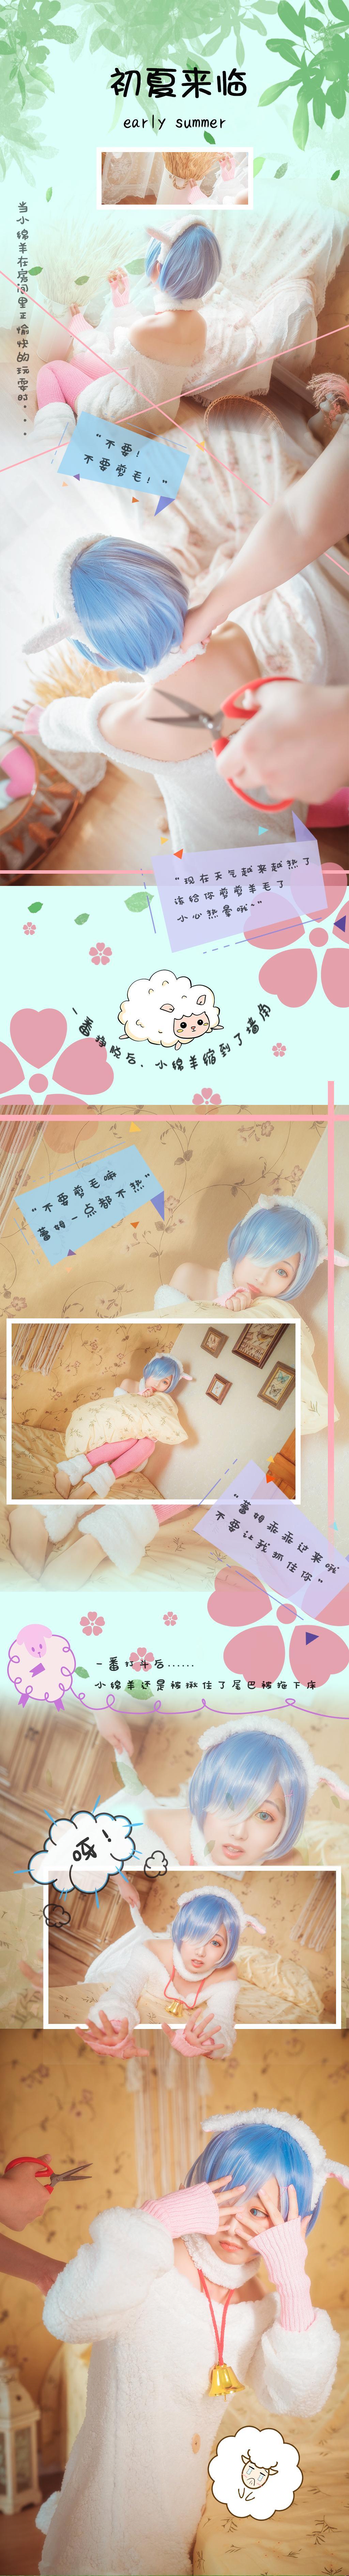 《RE:从零开始的异世界生活》正片cosplay【CN:珸茗】-第1张